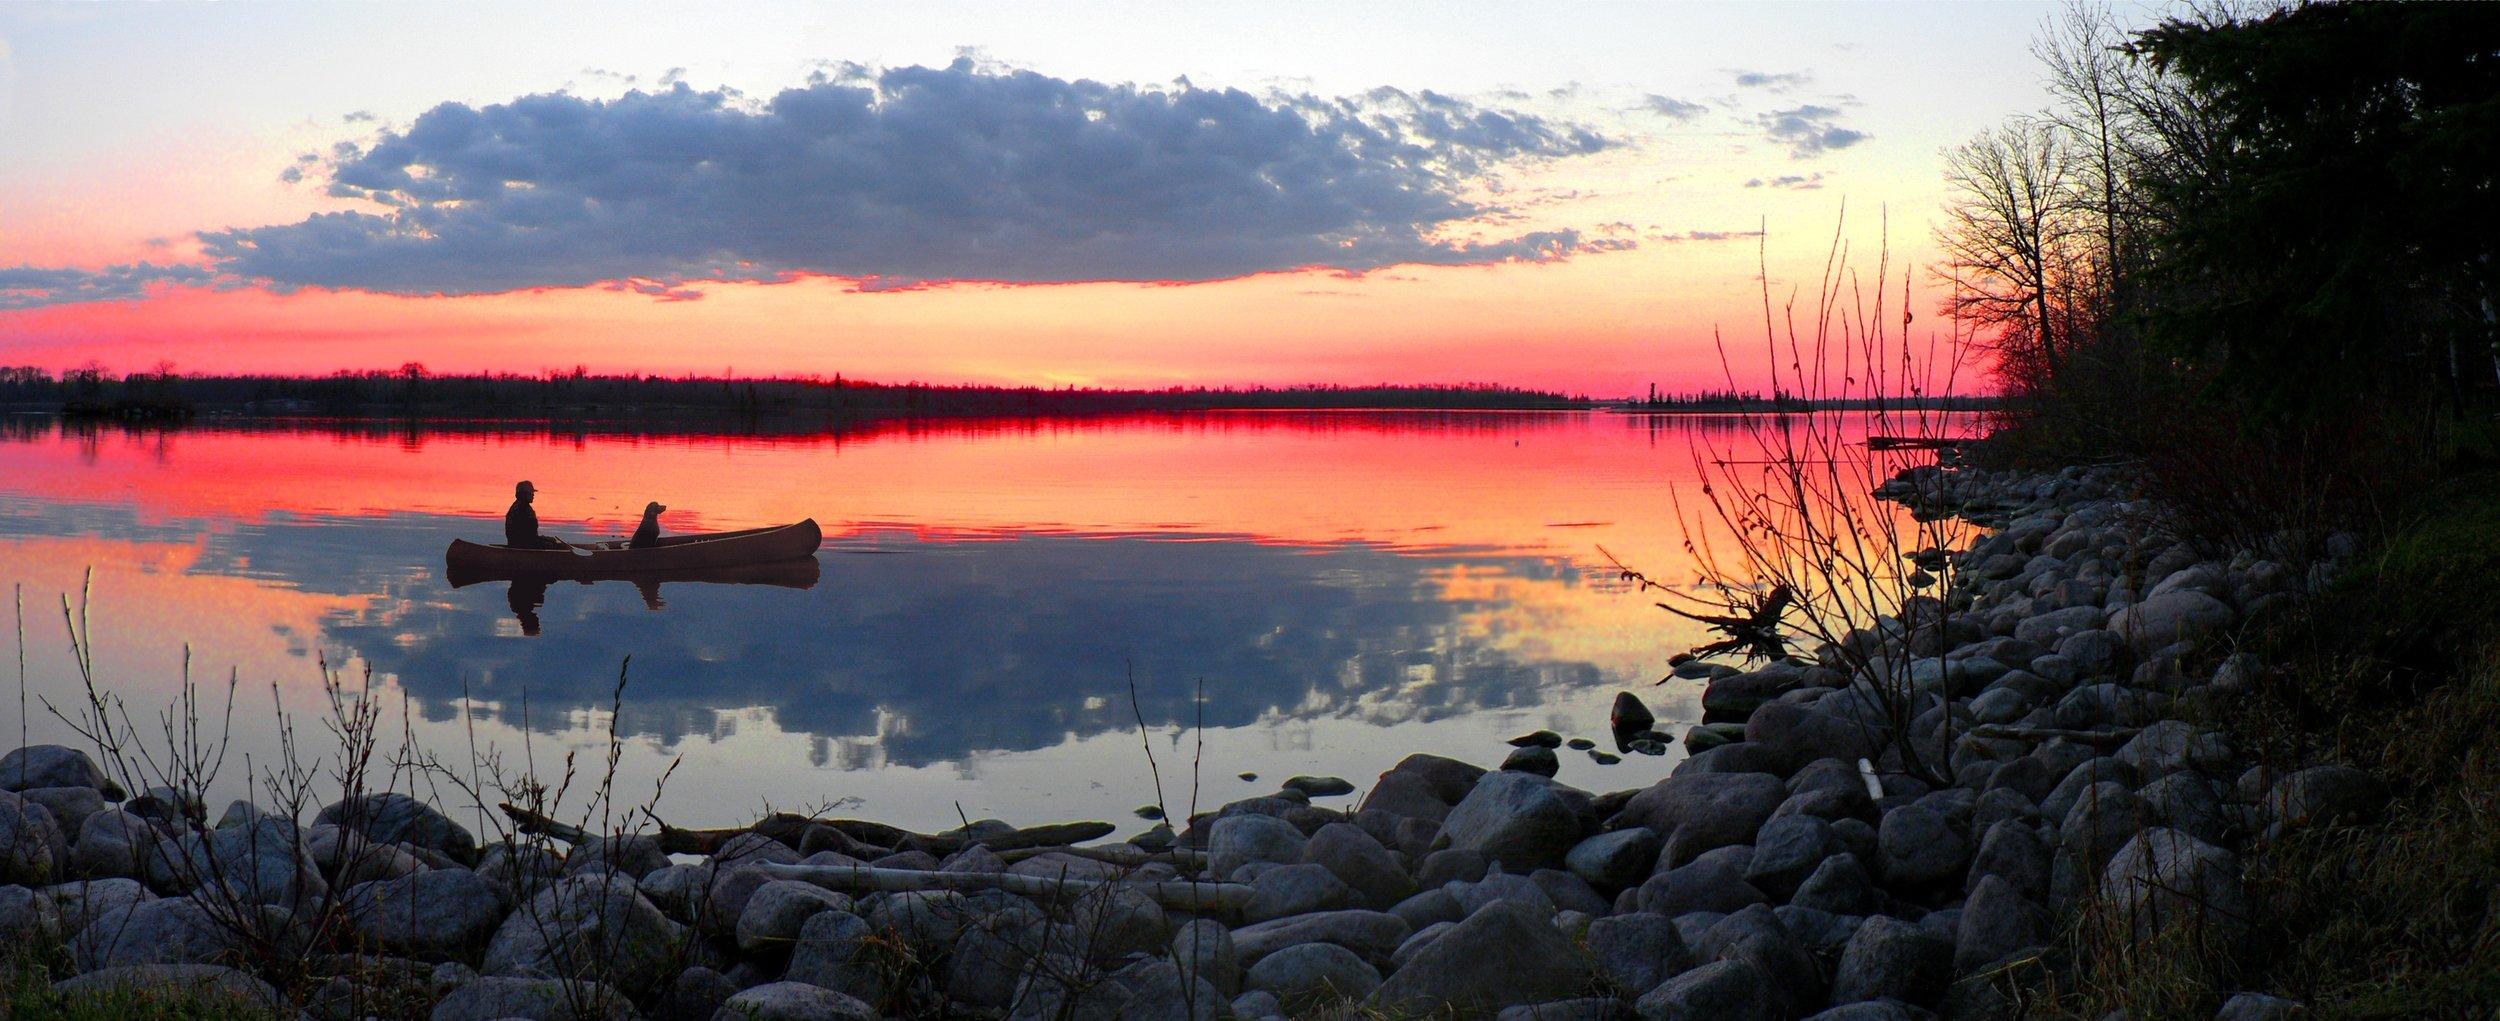 mGRYHbPQSny51ZP9wUCM_full_canoe sunset.jpg